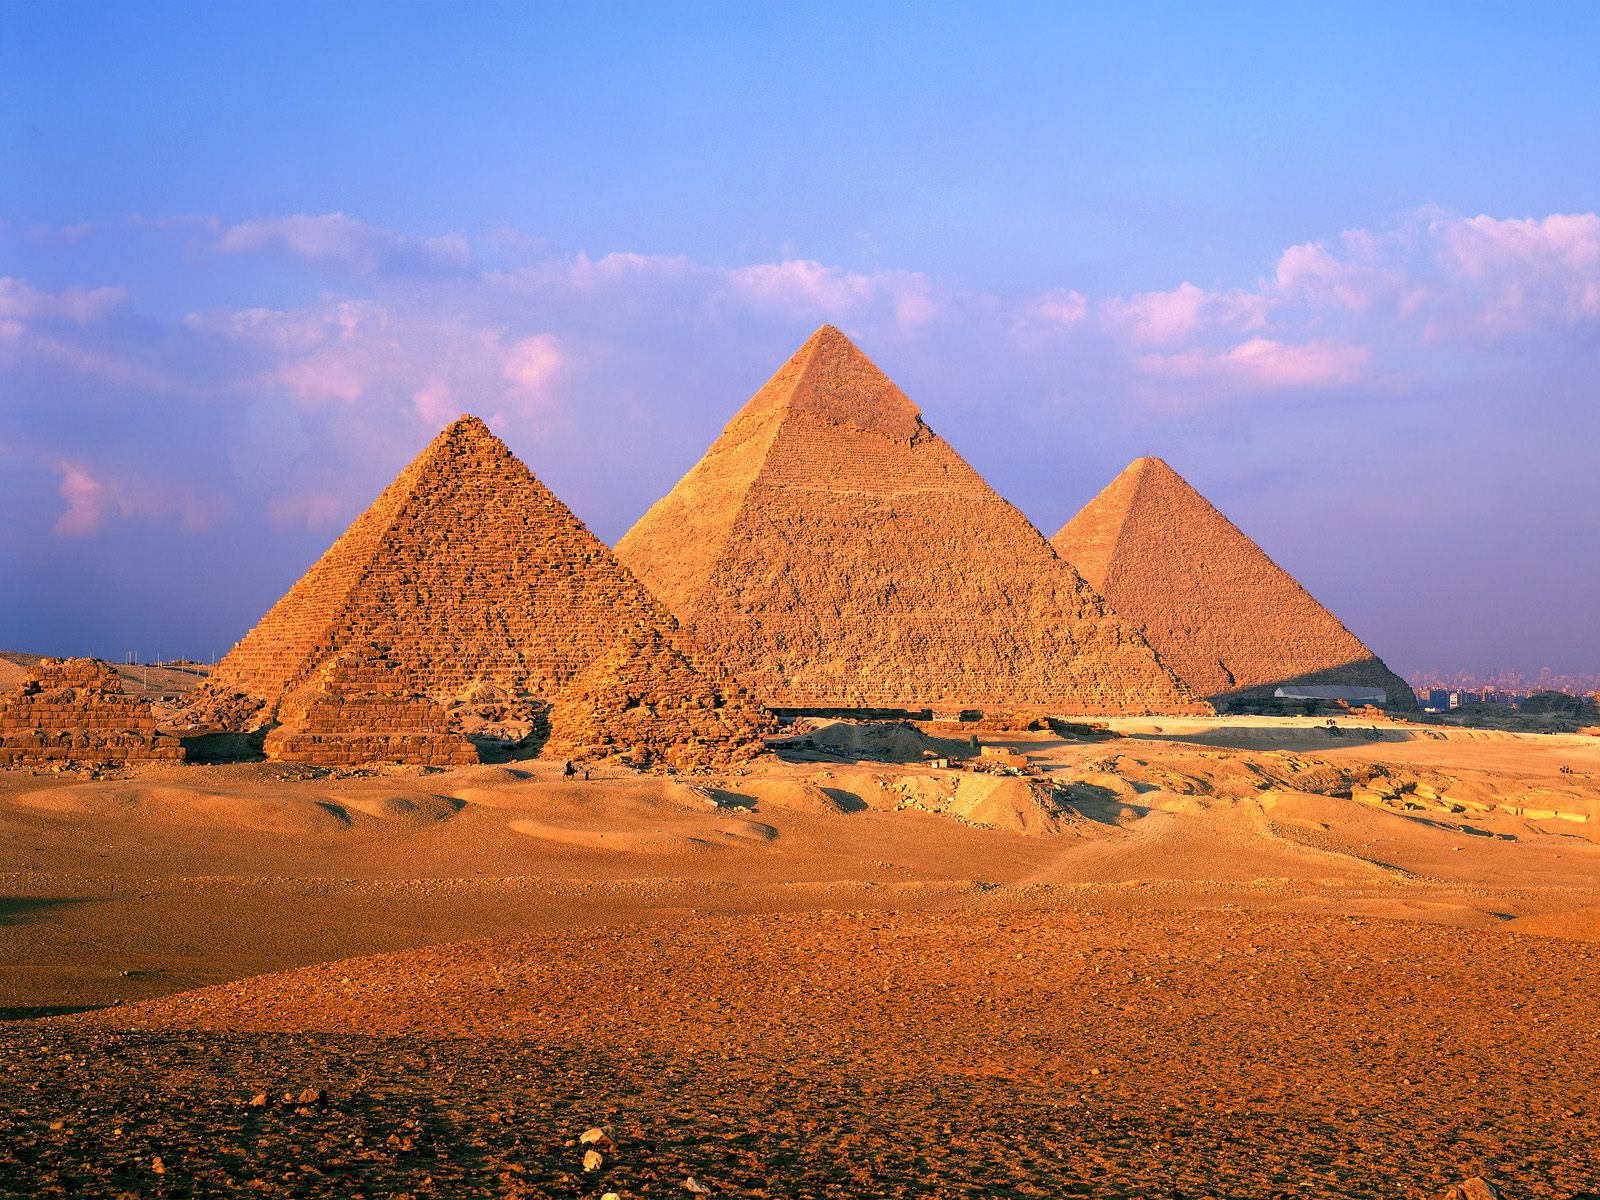 http://4.bp.blogspot.com/-3F-scZcztzs/T_71PTWh2rI/AAAAAAAAEzw/jnB-VaodCiM/s1600/Egyptian-Pyramids-HD-Wallpaper-2.jpg